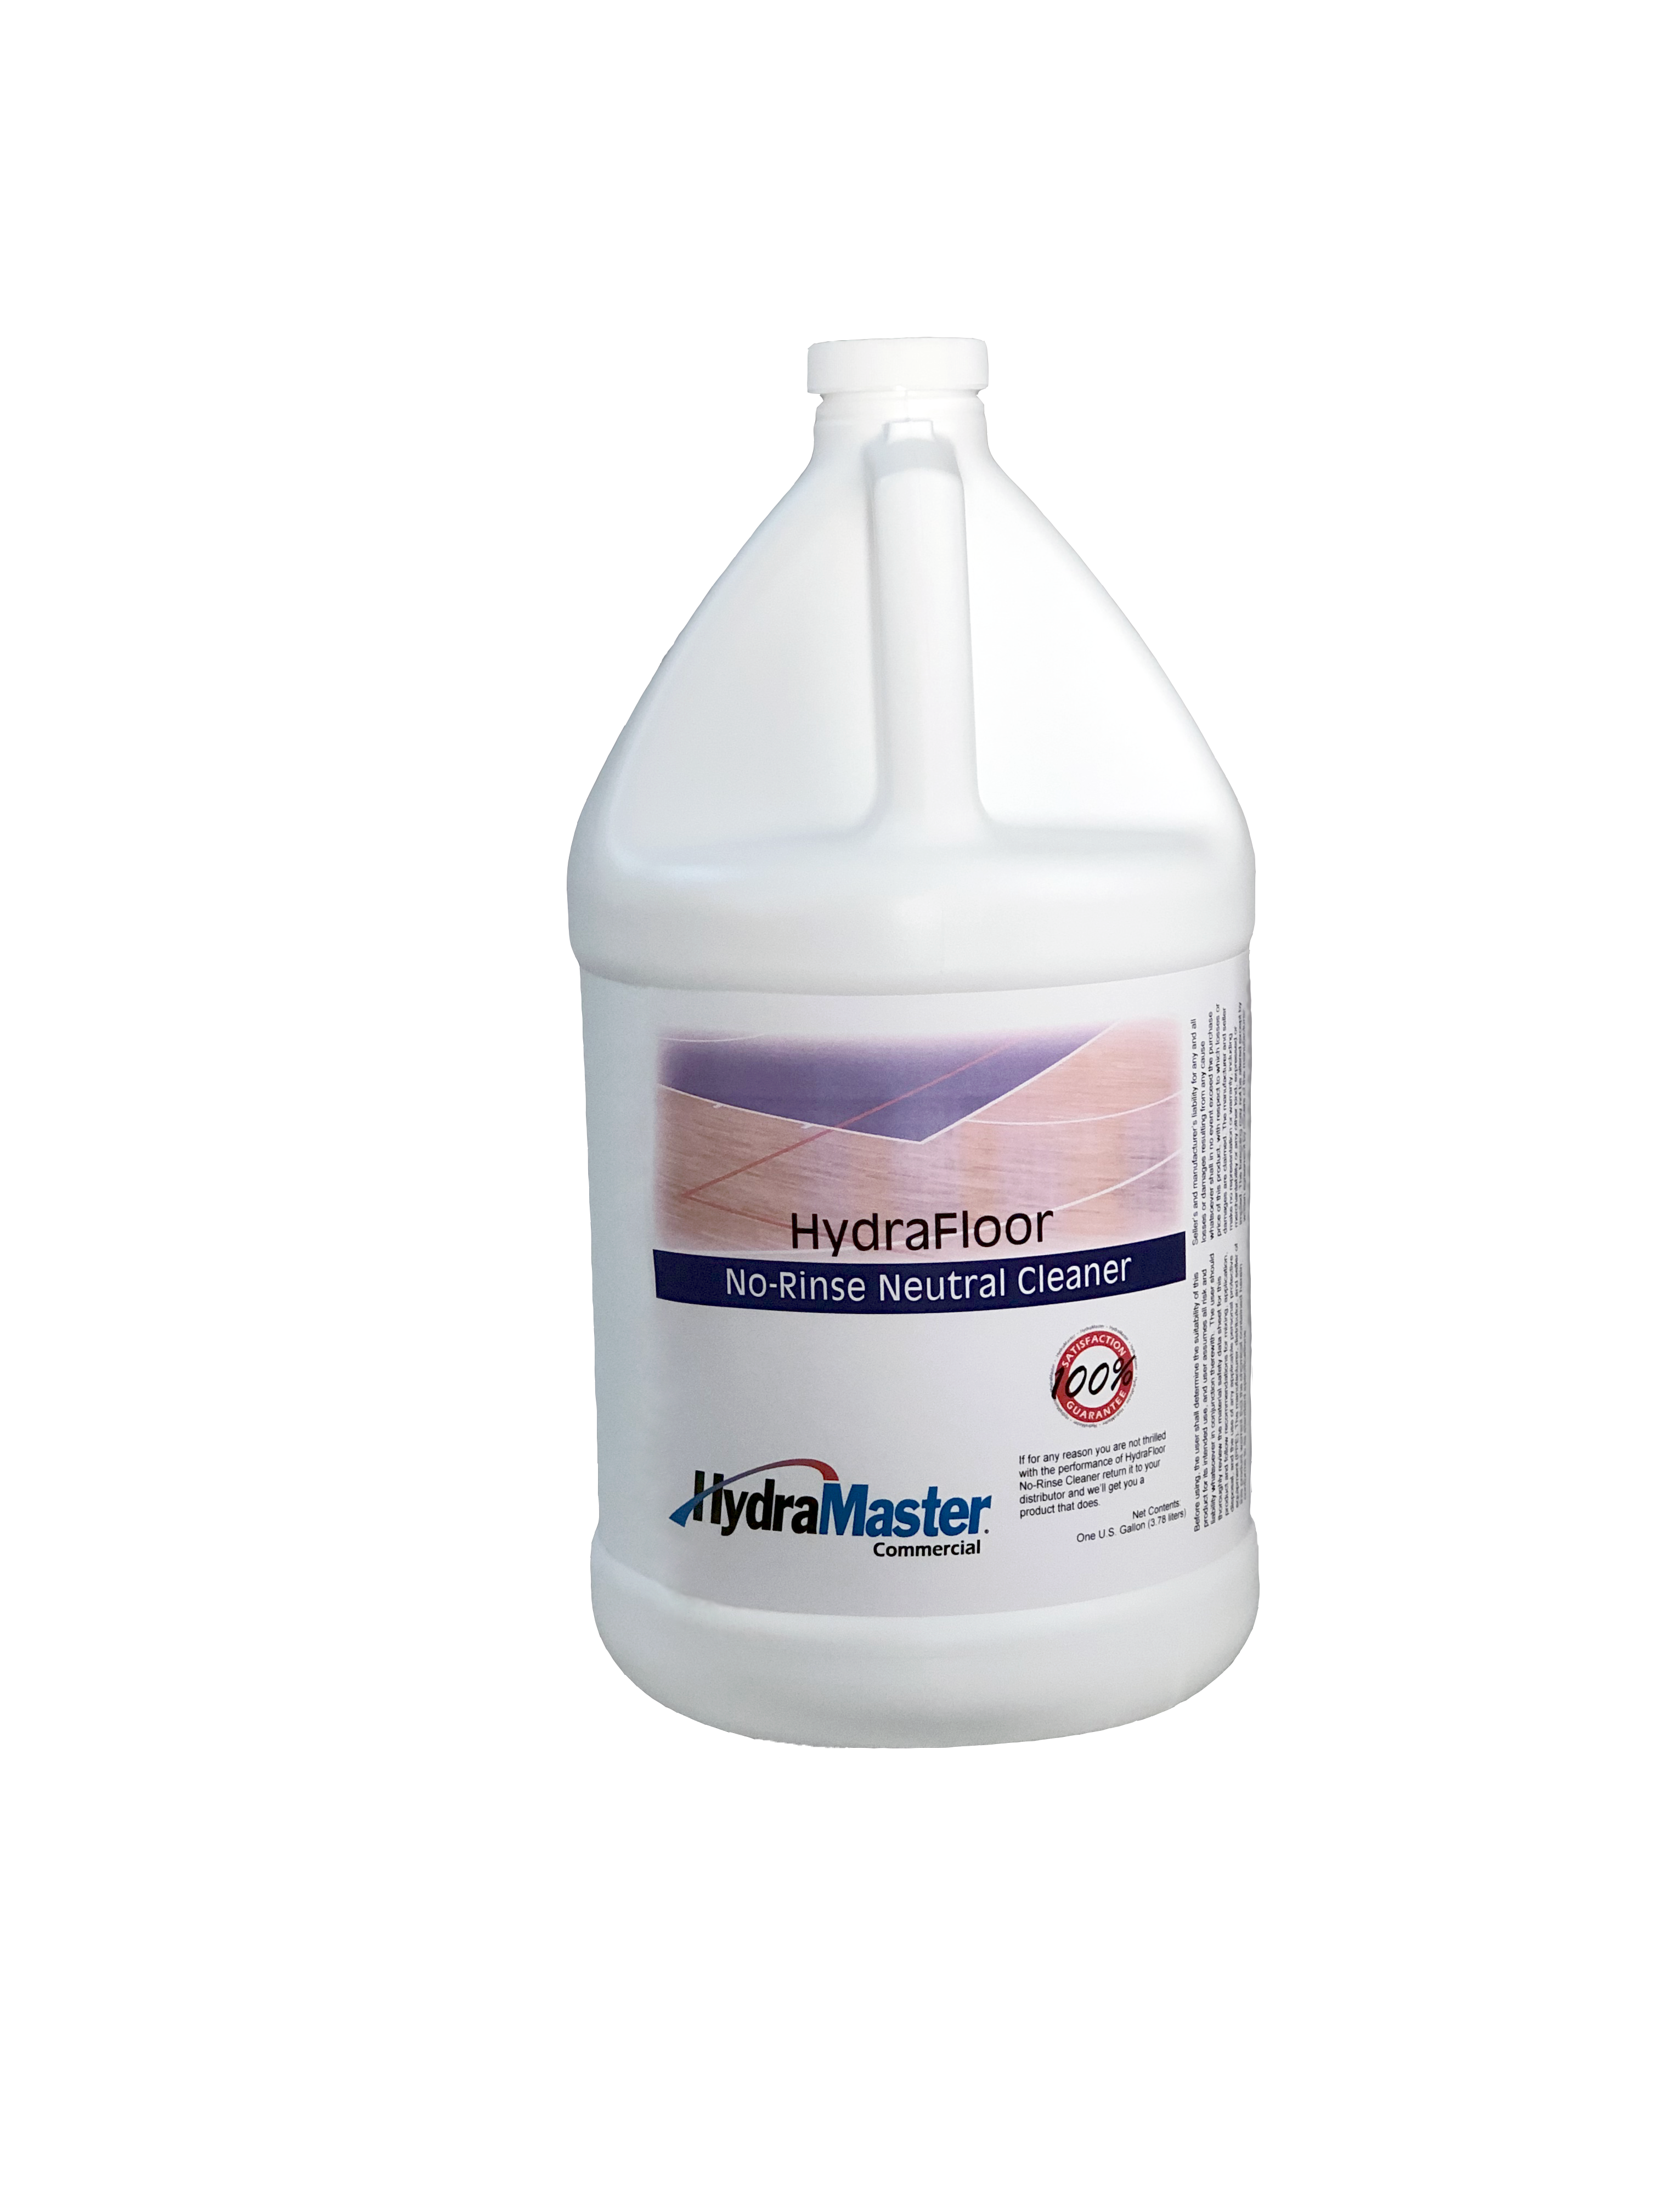 HydraFloor No Rinse Neutral Cleaner